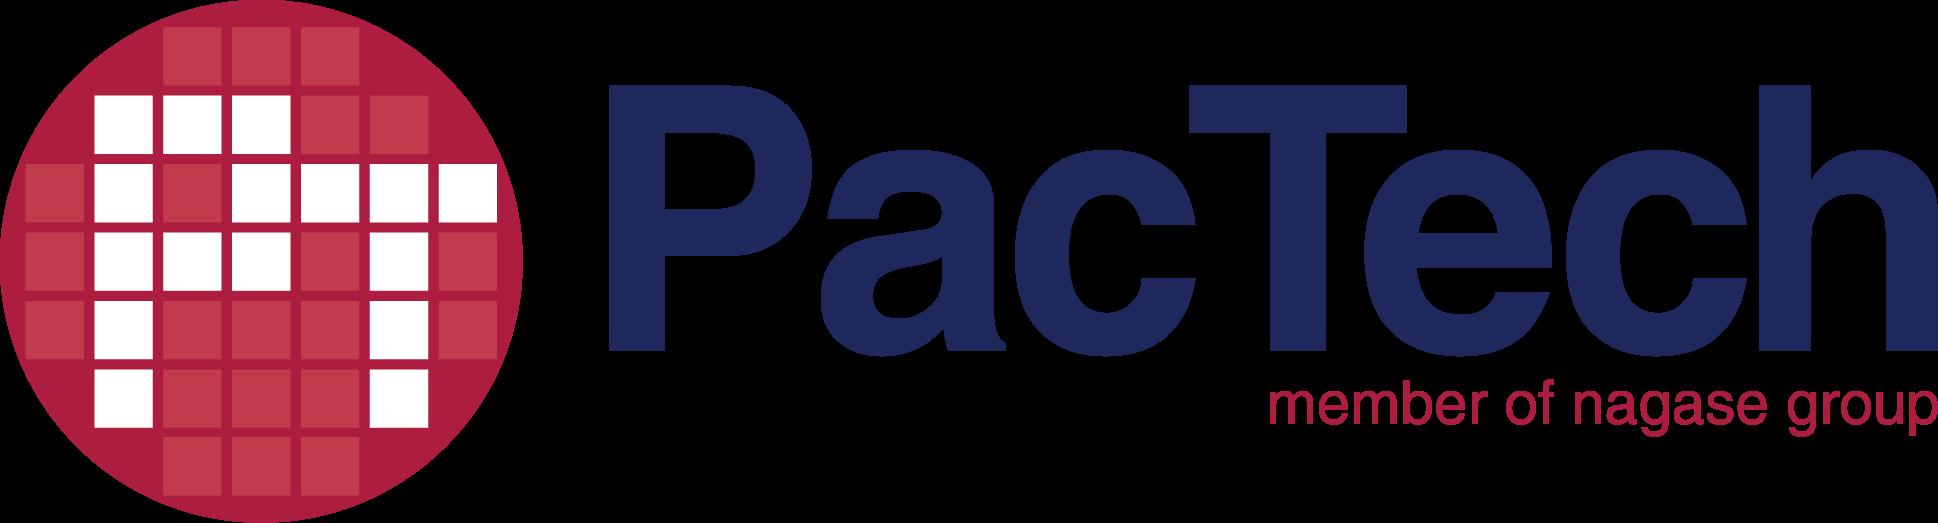 20_PacTech_Logo_CS3_mit_tra.png